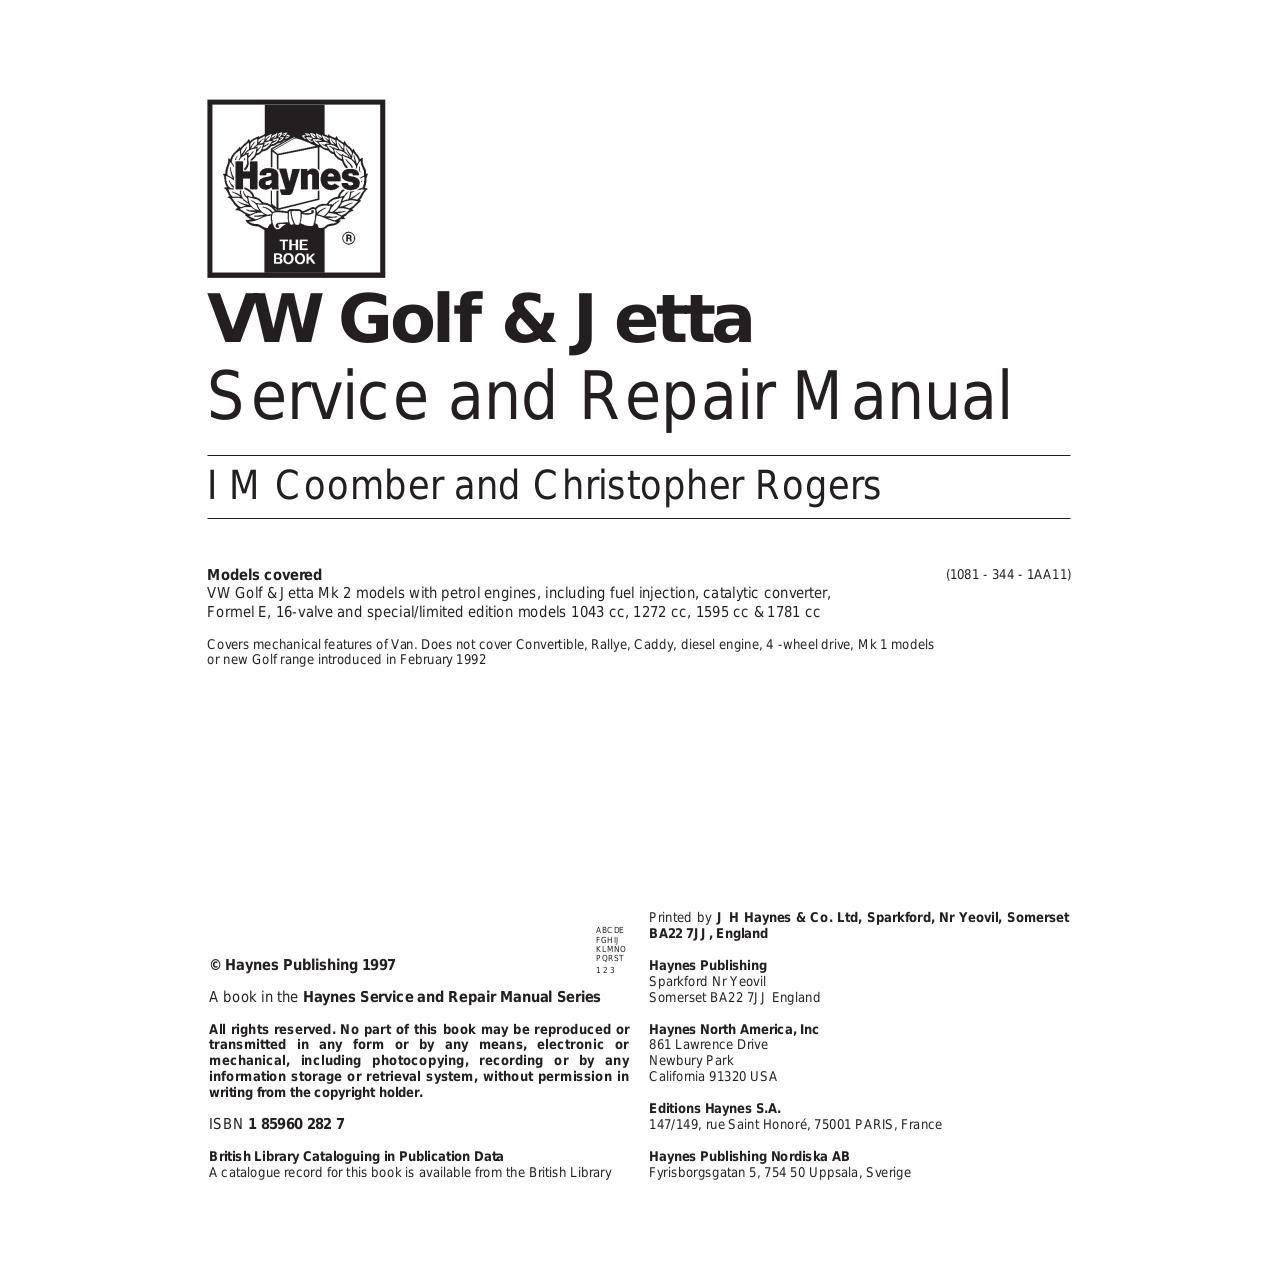 Haynes Golf2 84 92 Essence N 1081 Par Fourbi Revue Technique Vw Jetta Vr6 Engine Diagram Additionally On Harley Fuel Pet Volkswagen Golf 2 1984 1992